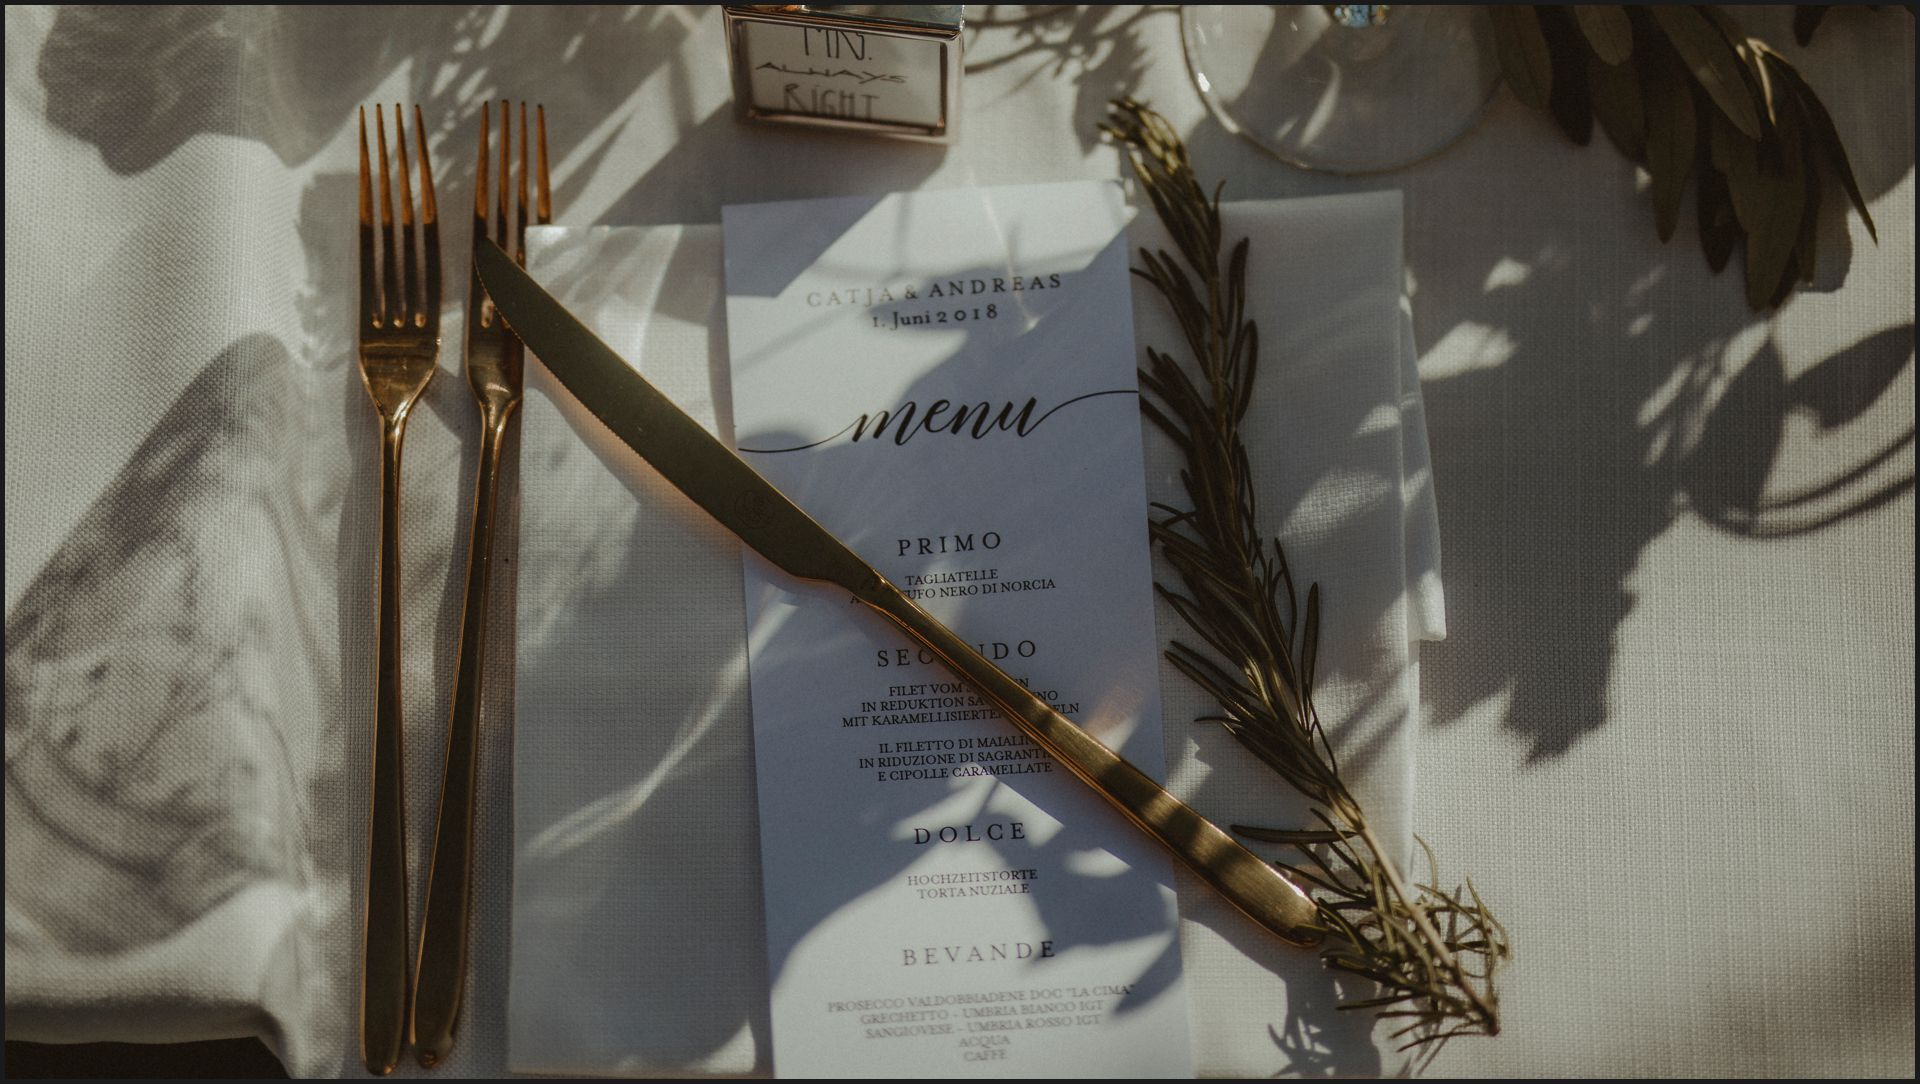 wedding, details, table set, menu, umbria, nikis resort, love